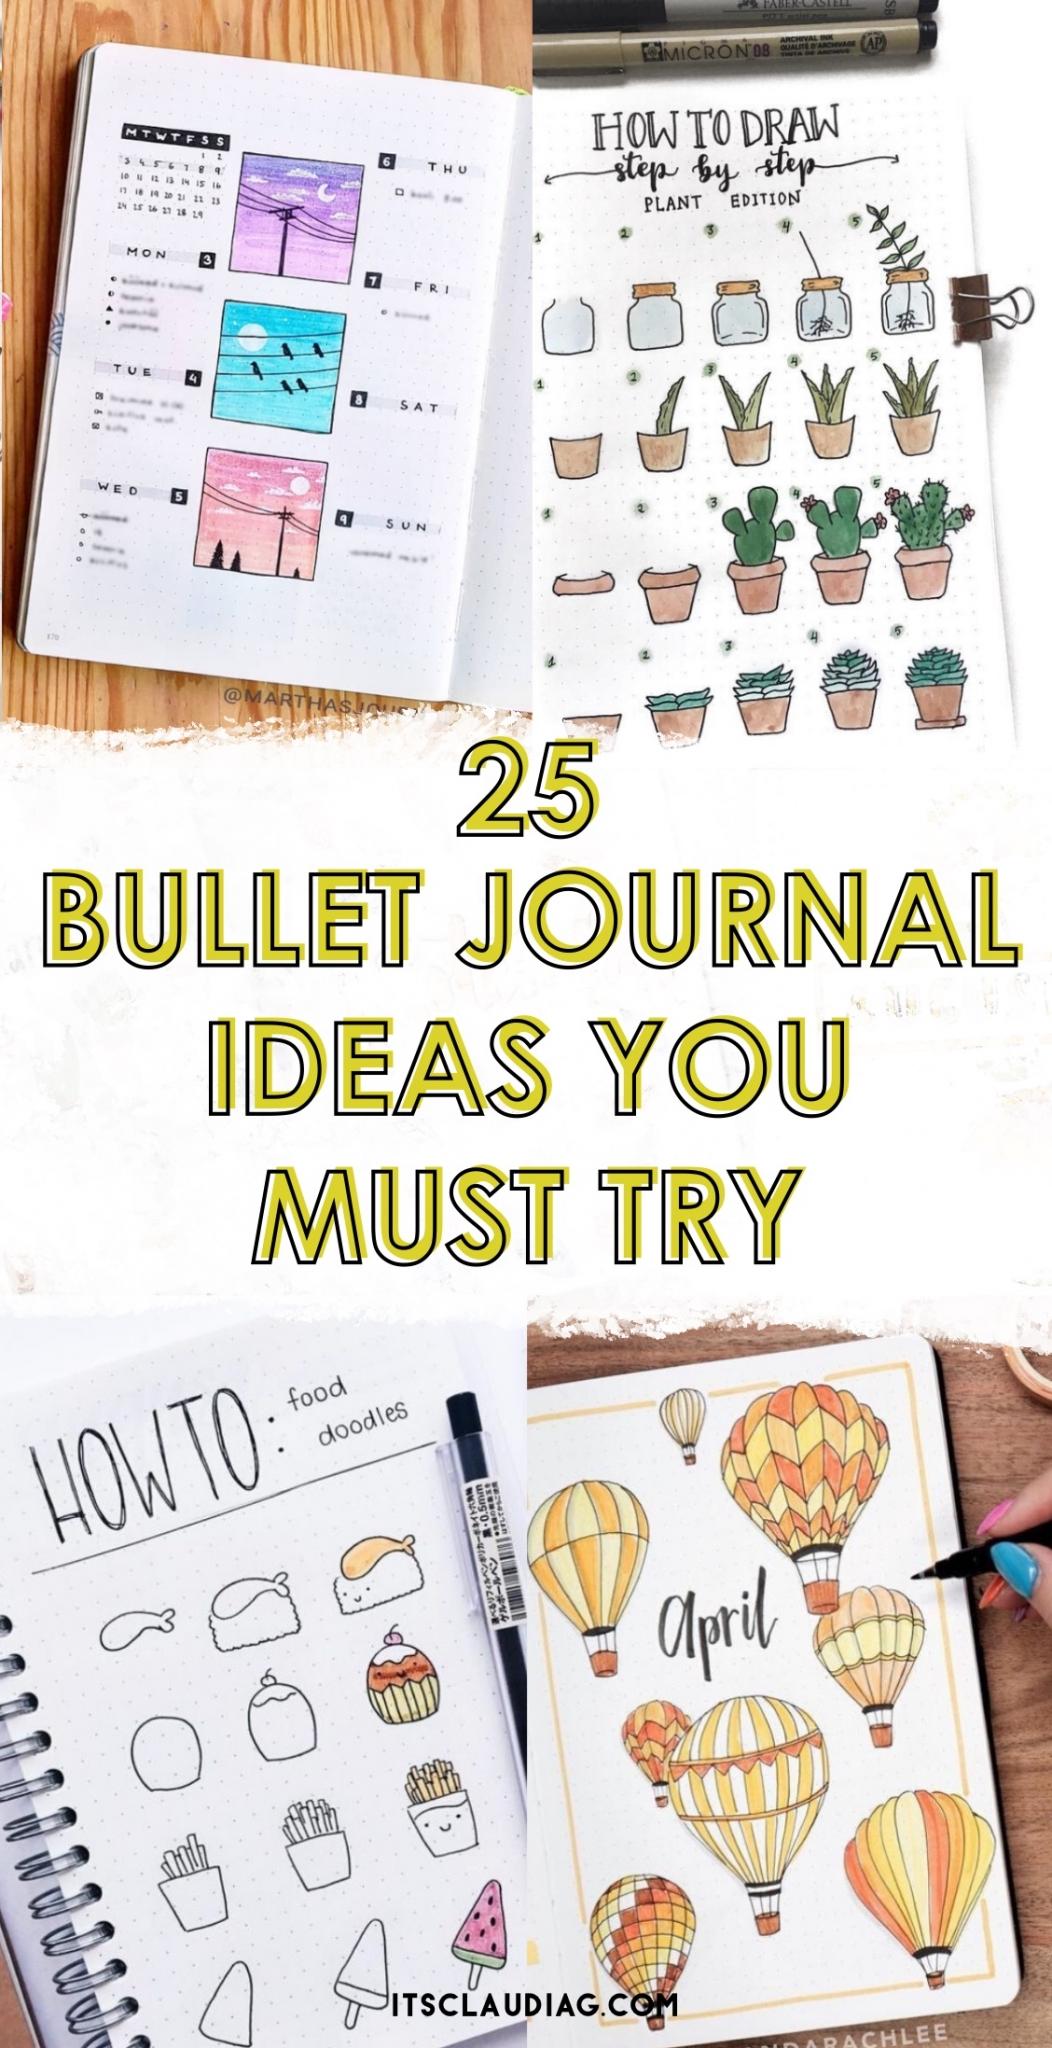 Bullet Journal Ideas: 25 Bullet Journal Spread Ideas For April